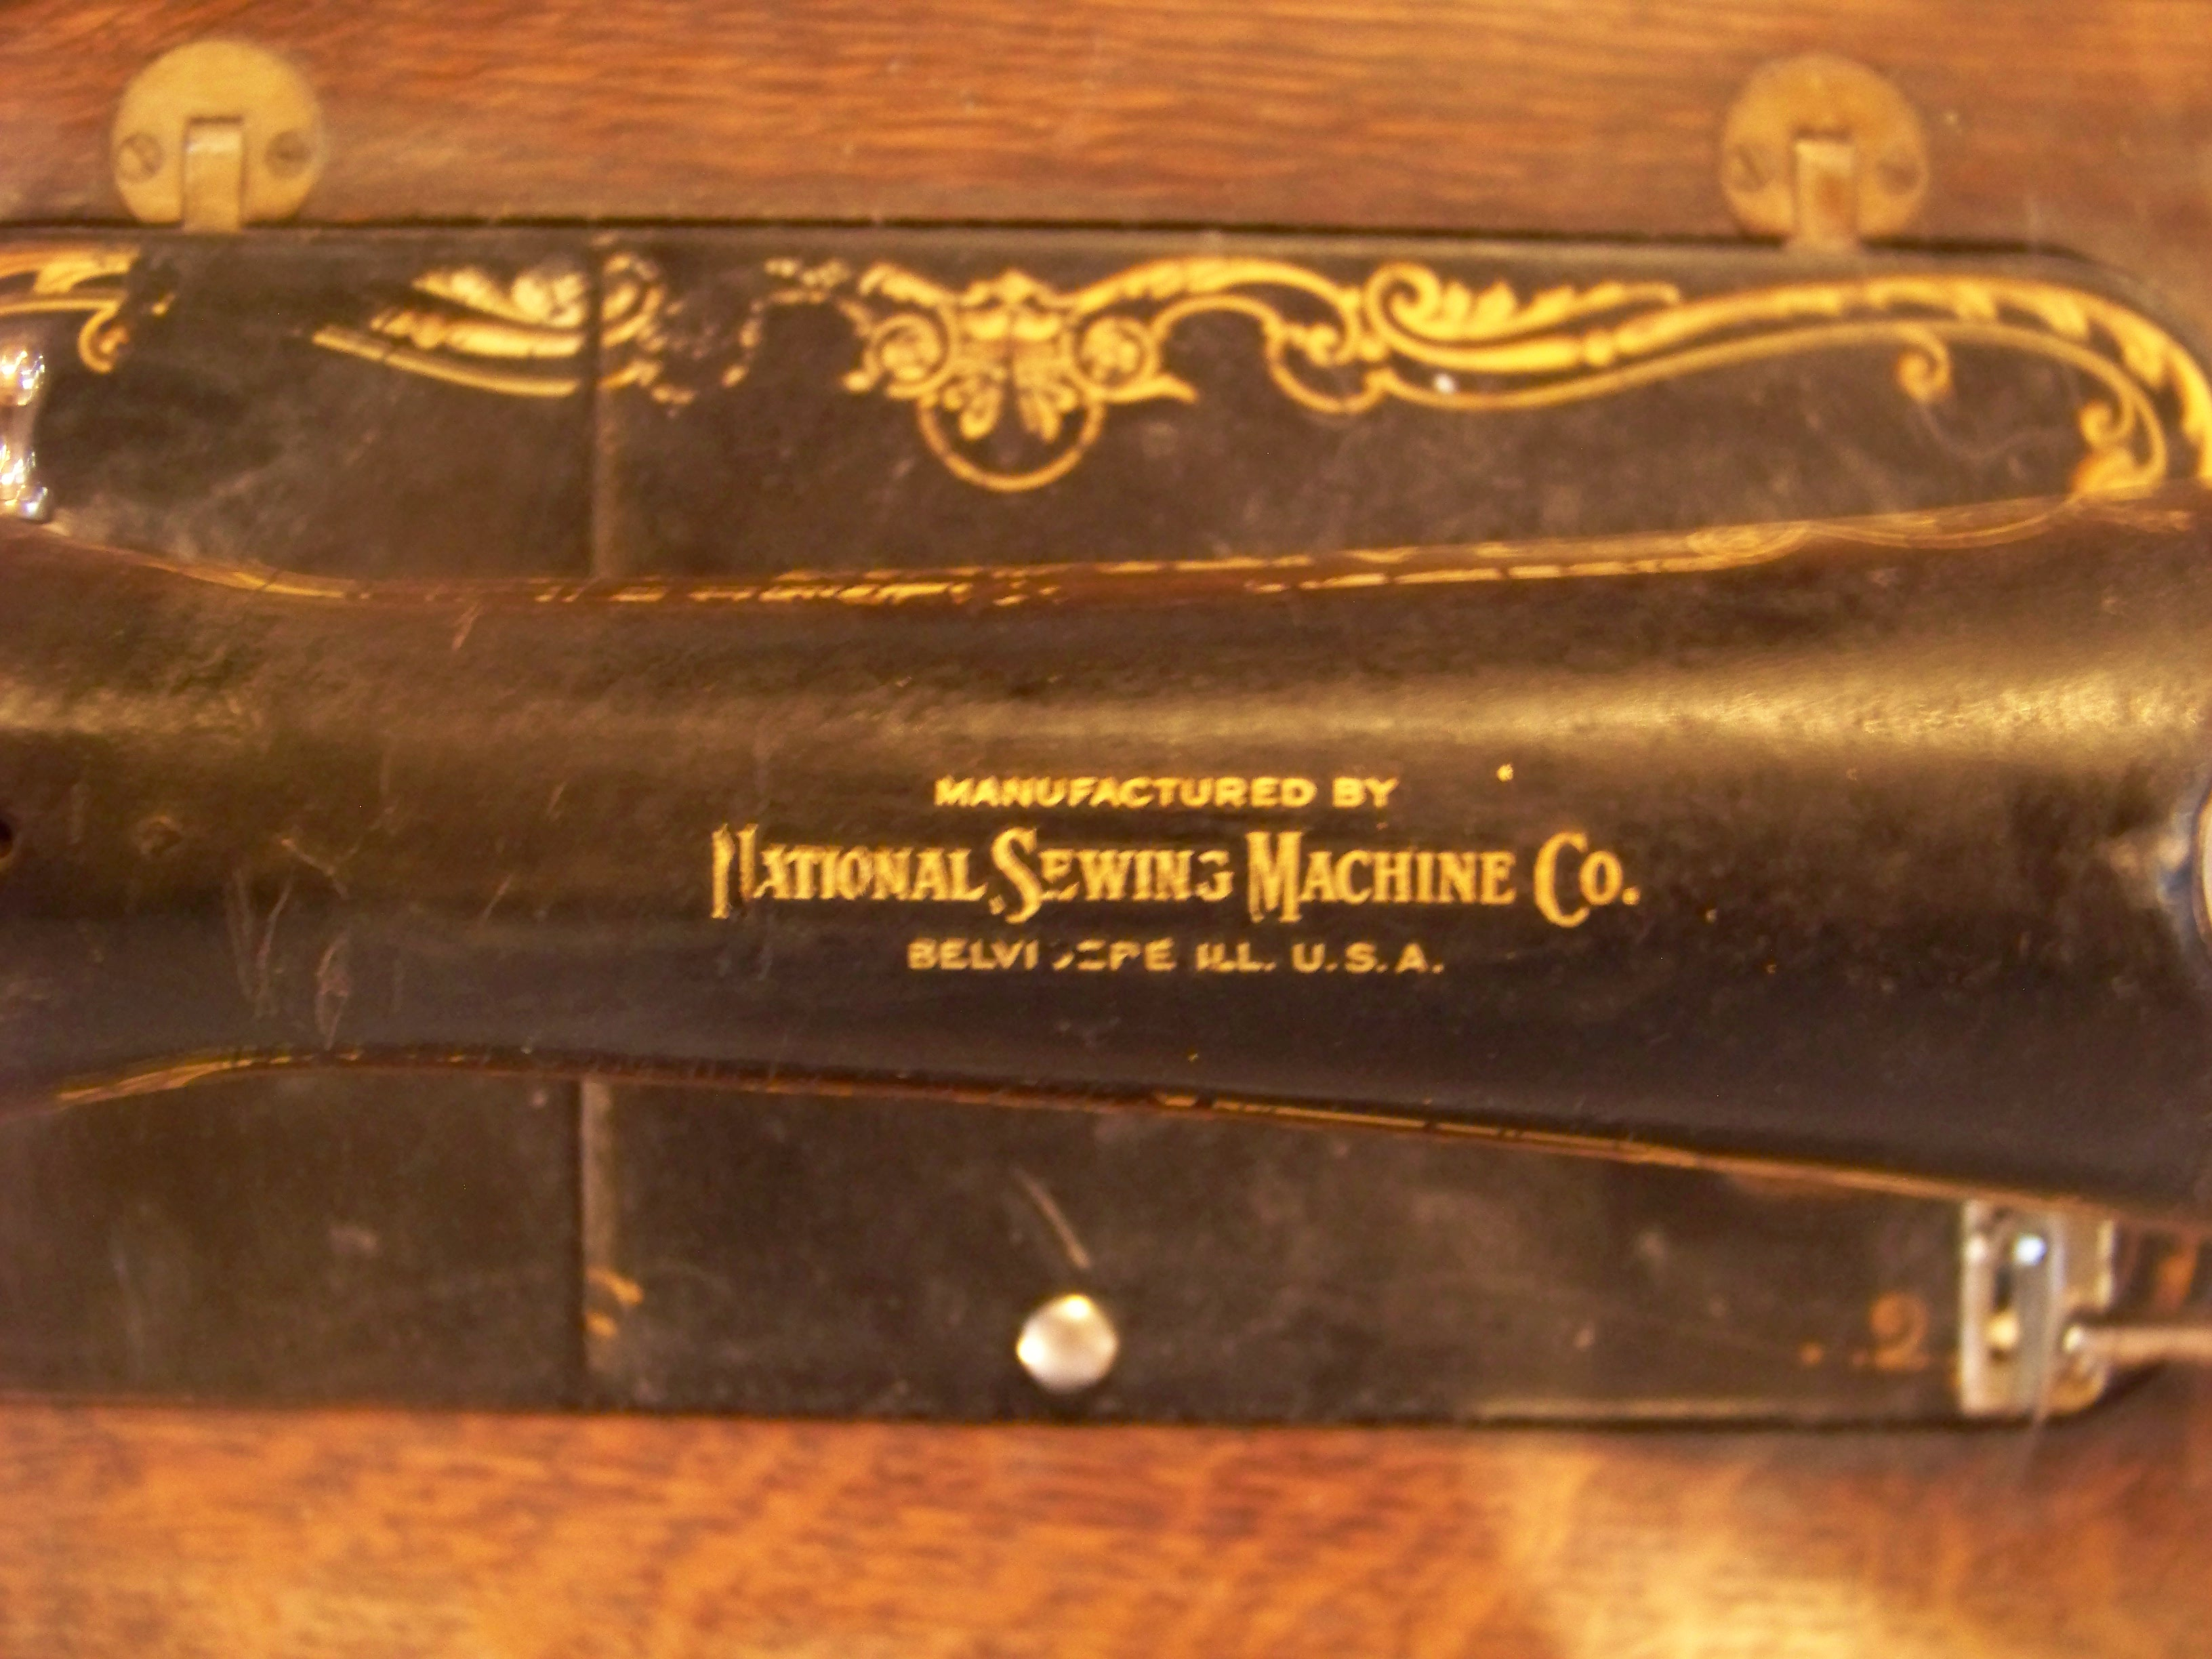 Name:  National Sewing Machine 027.JPG Views: 609 Size:  907.1 KB